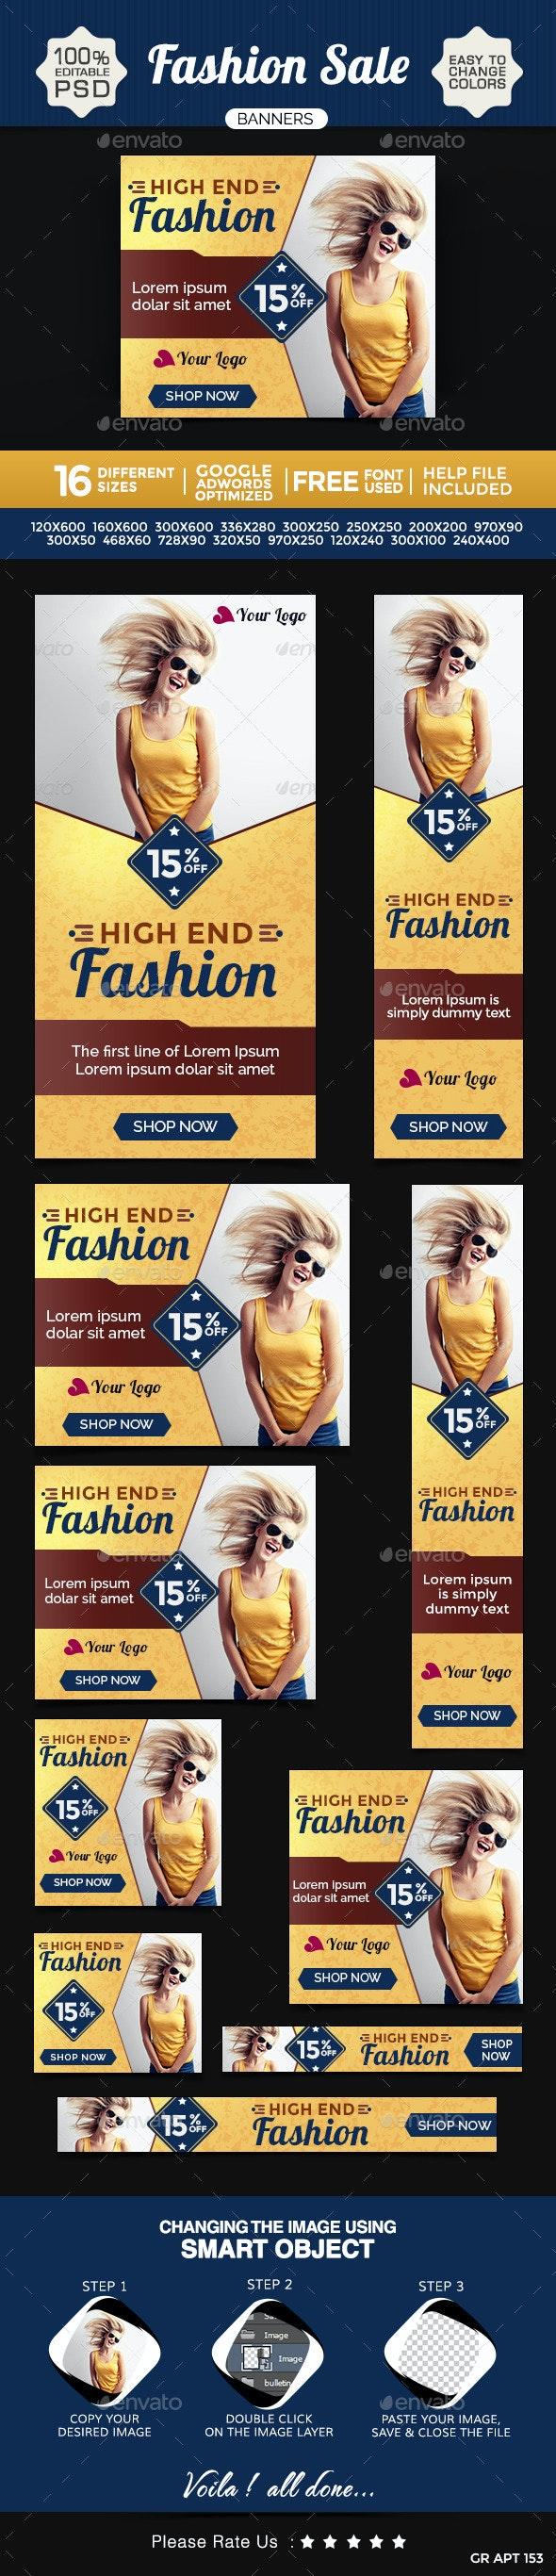 Fashion Banners Design Set - Banners & Ads Web Elements